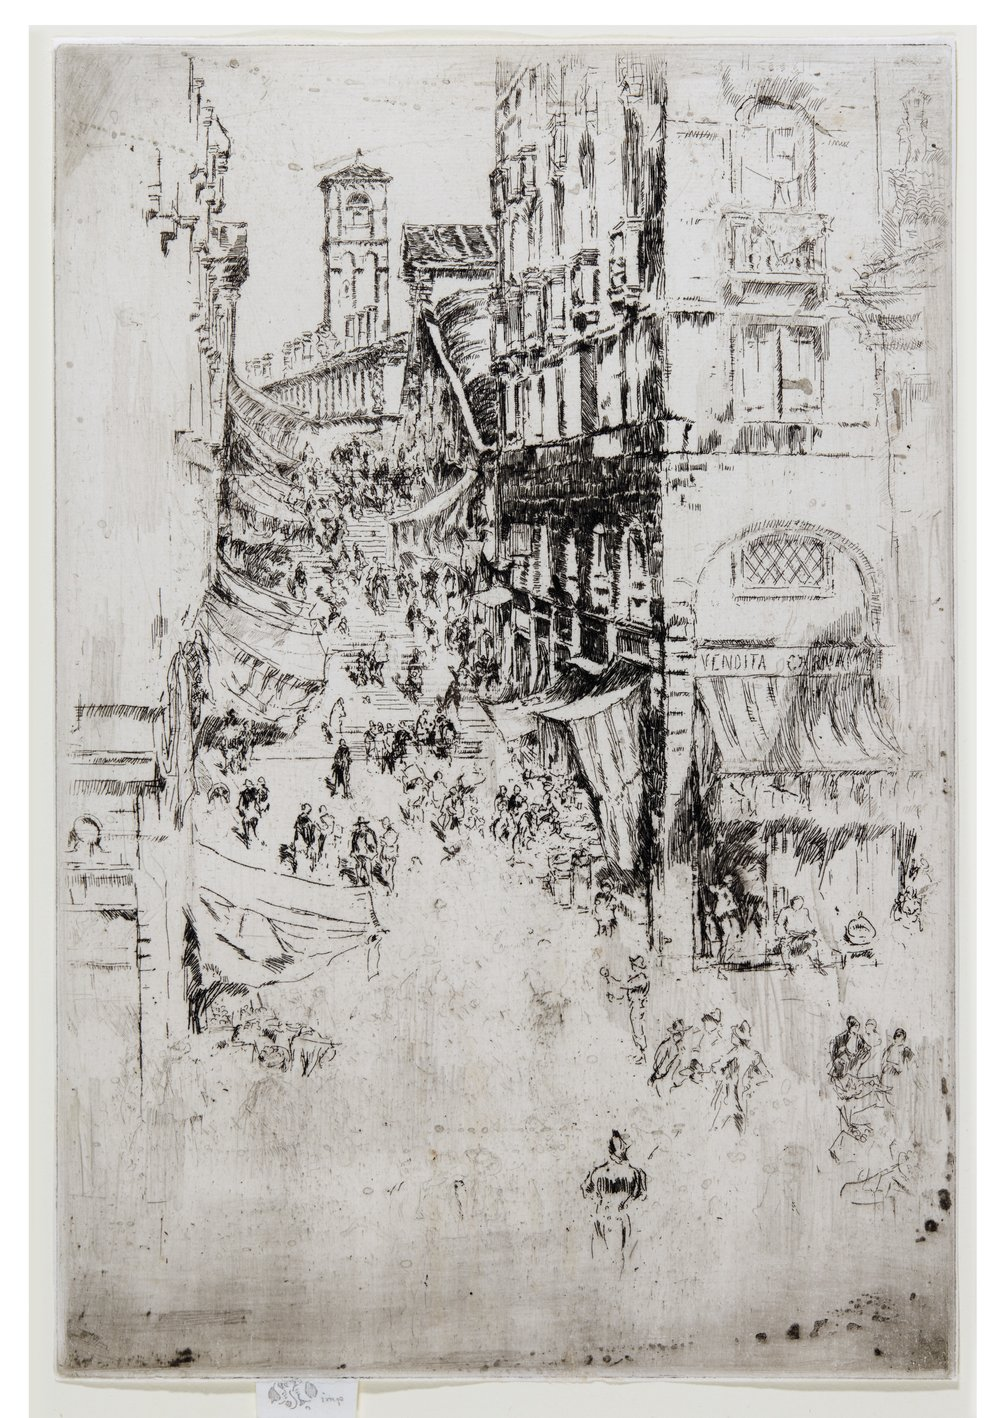 James McNeil Whistler, The Rialto, 1879 -80, est.£7,000 – 10,000.jpg